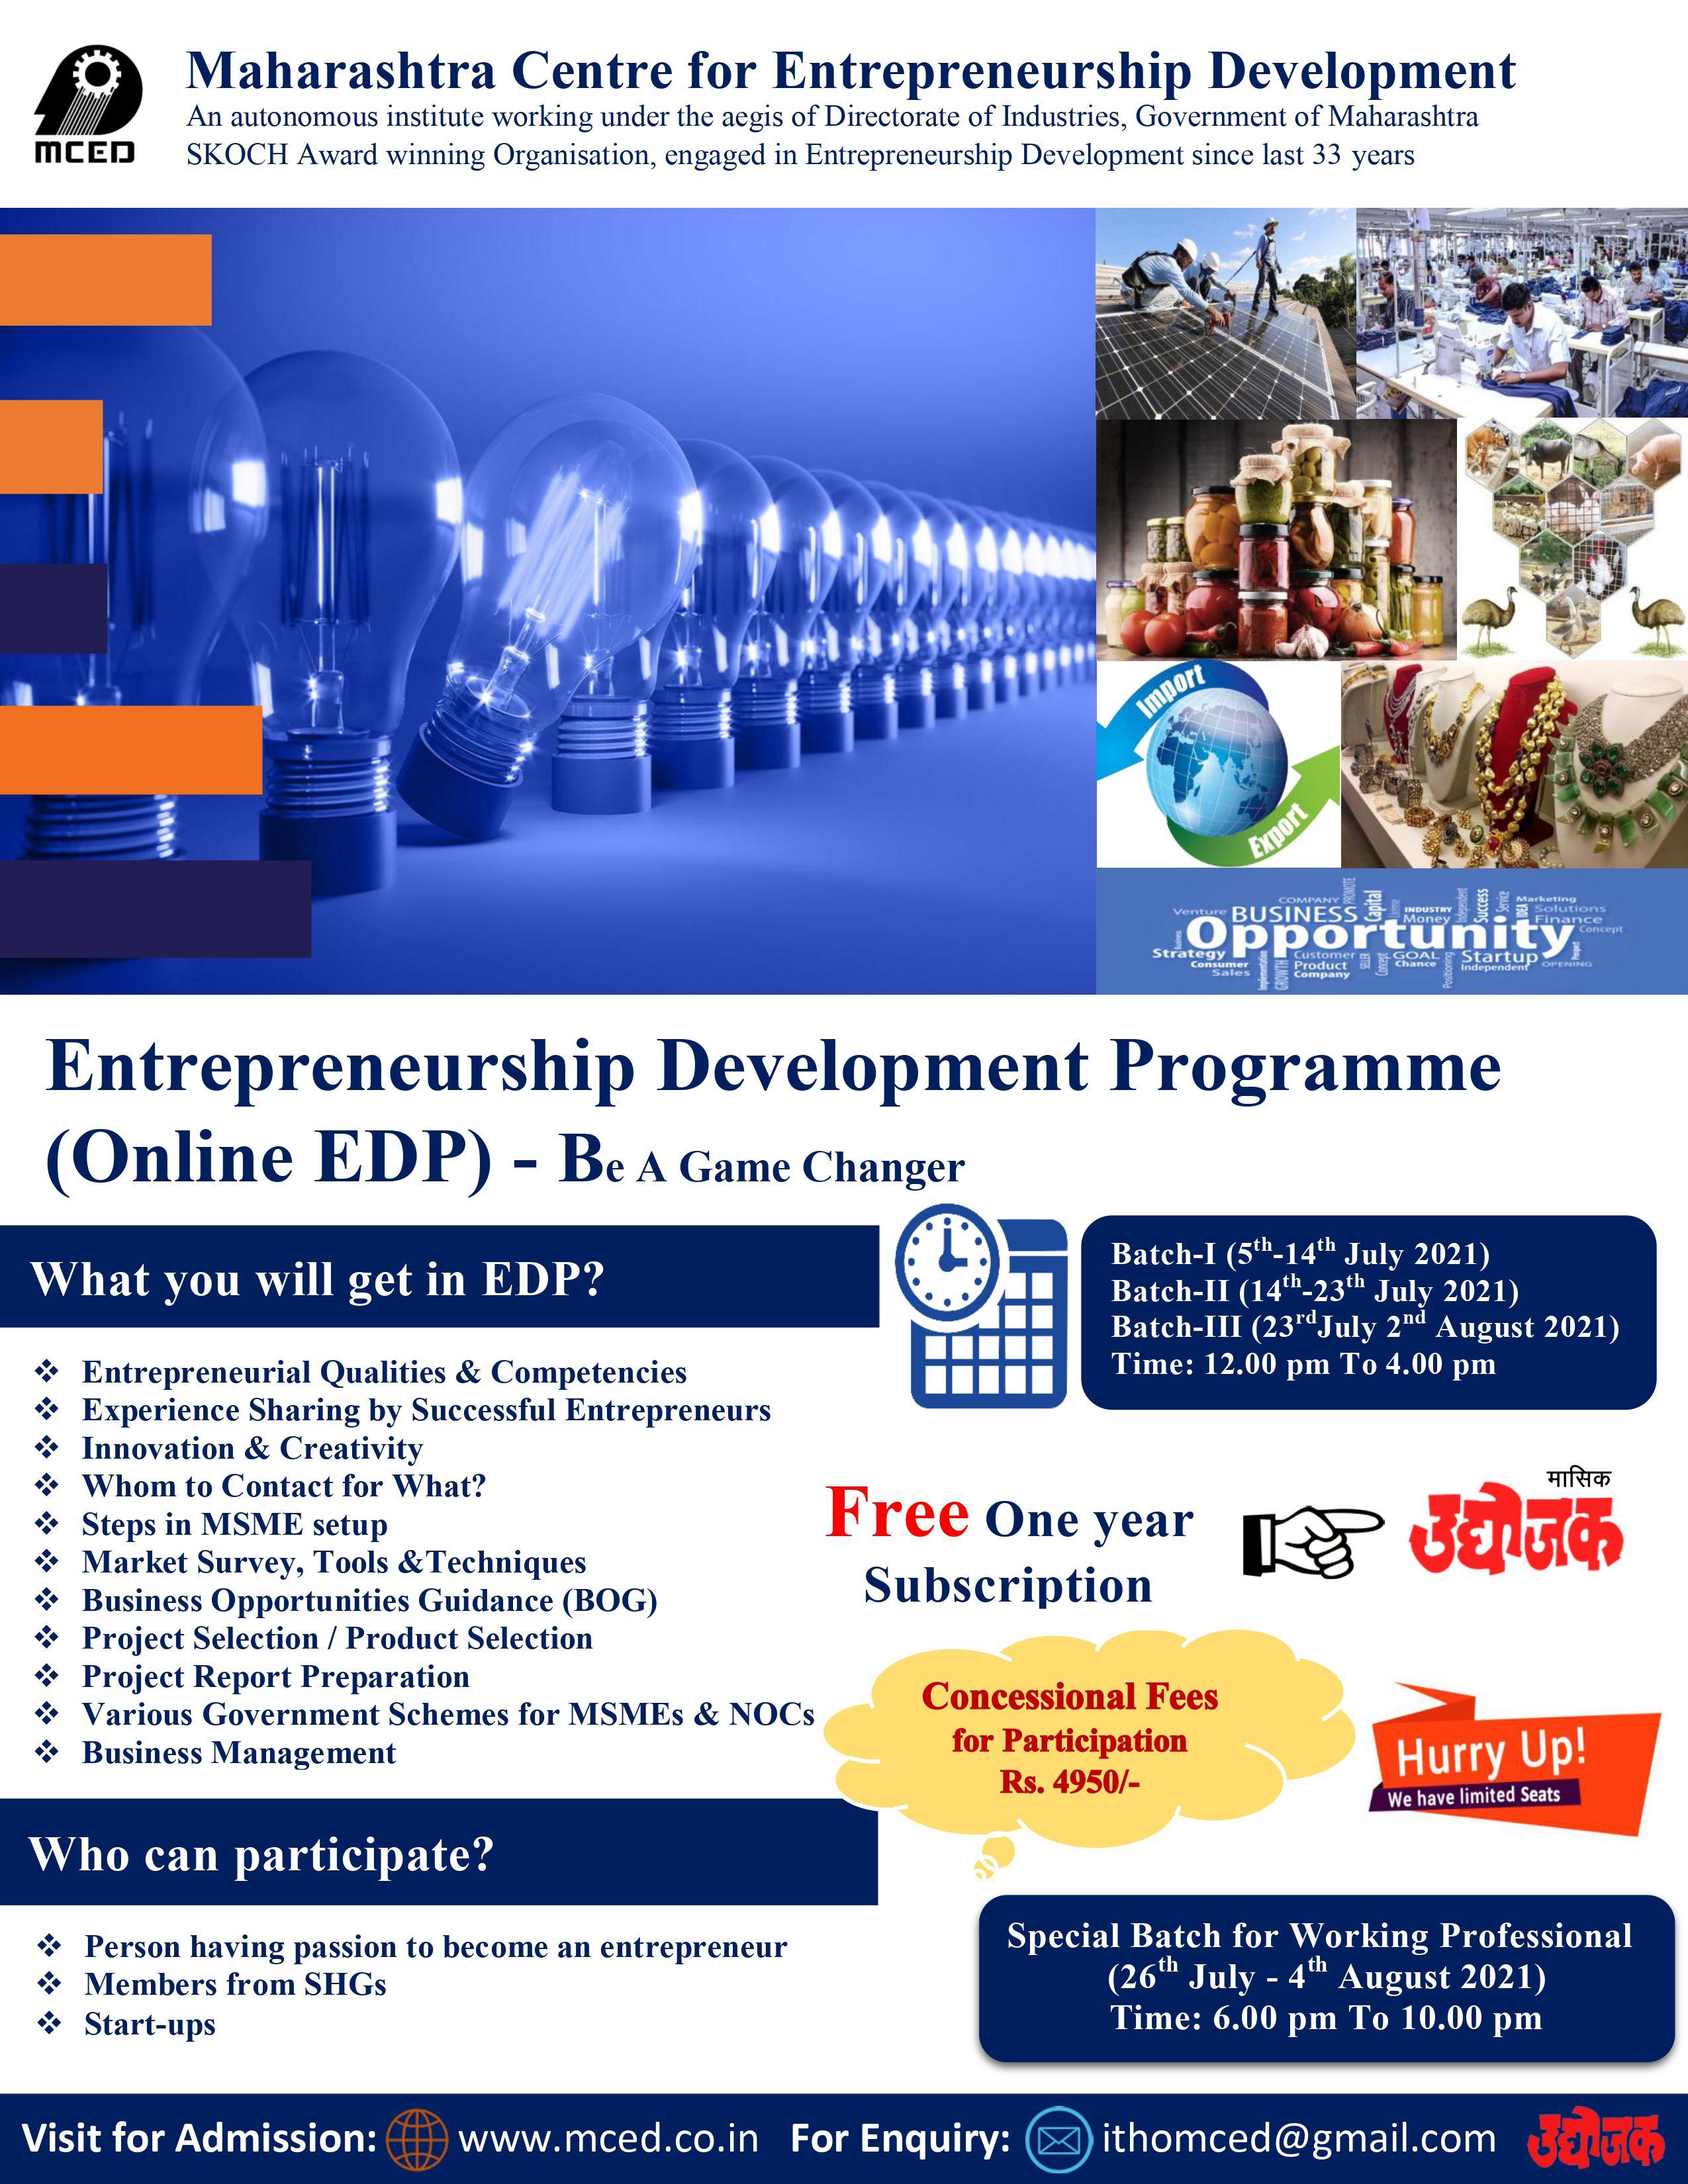 Entrepreneurship Development Programme (Online EDP) - Special EDP for Working Professionals